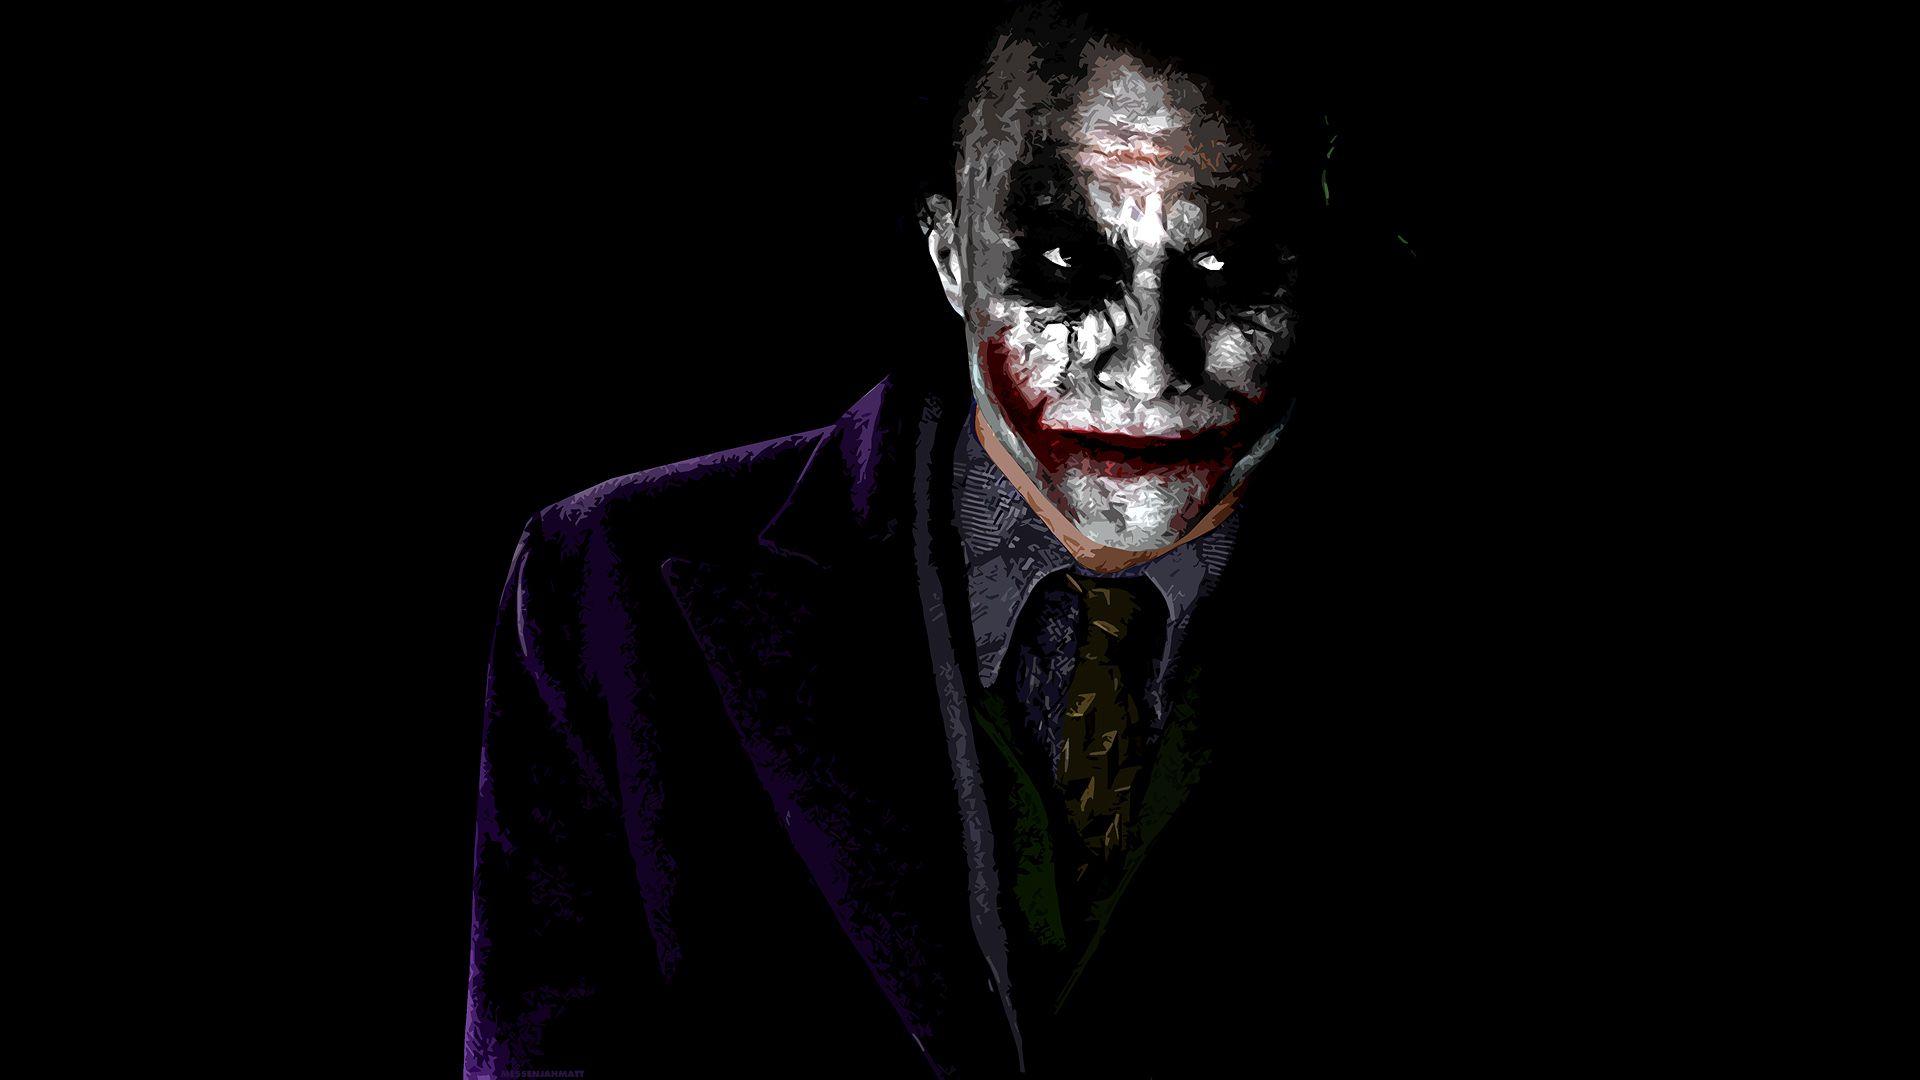 Joker 1920 X 1080 Joker Wallpapers Joker Hd Wallpaper Joker